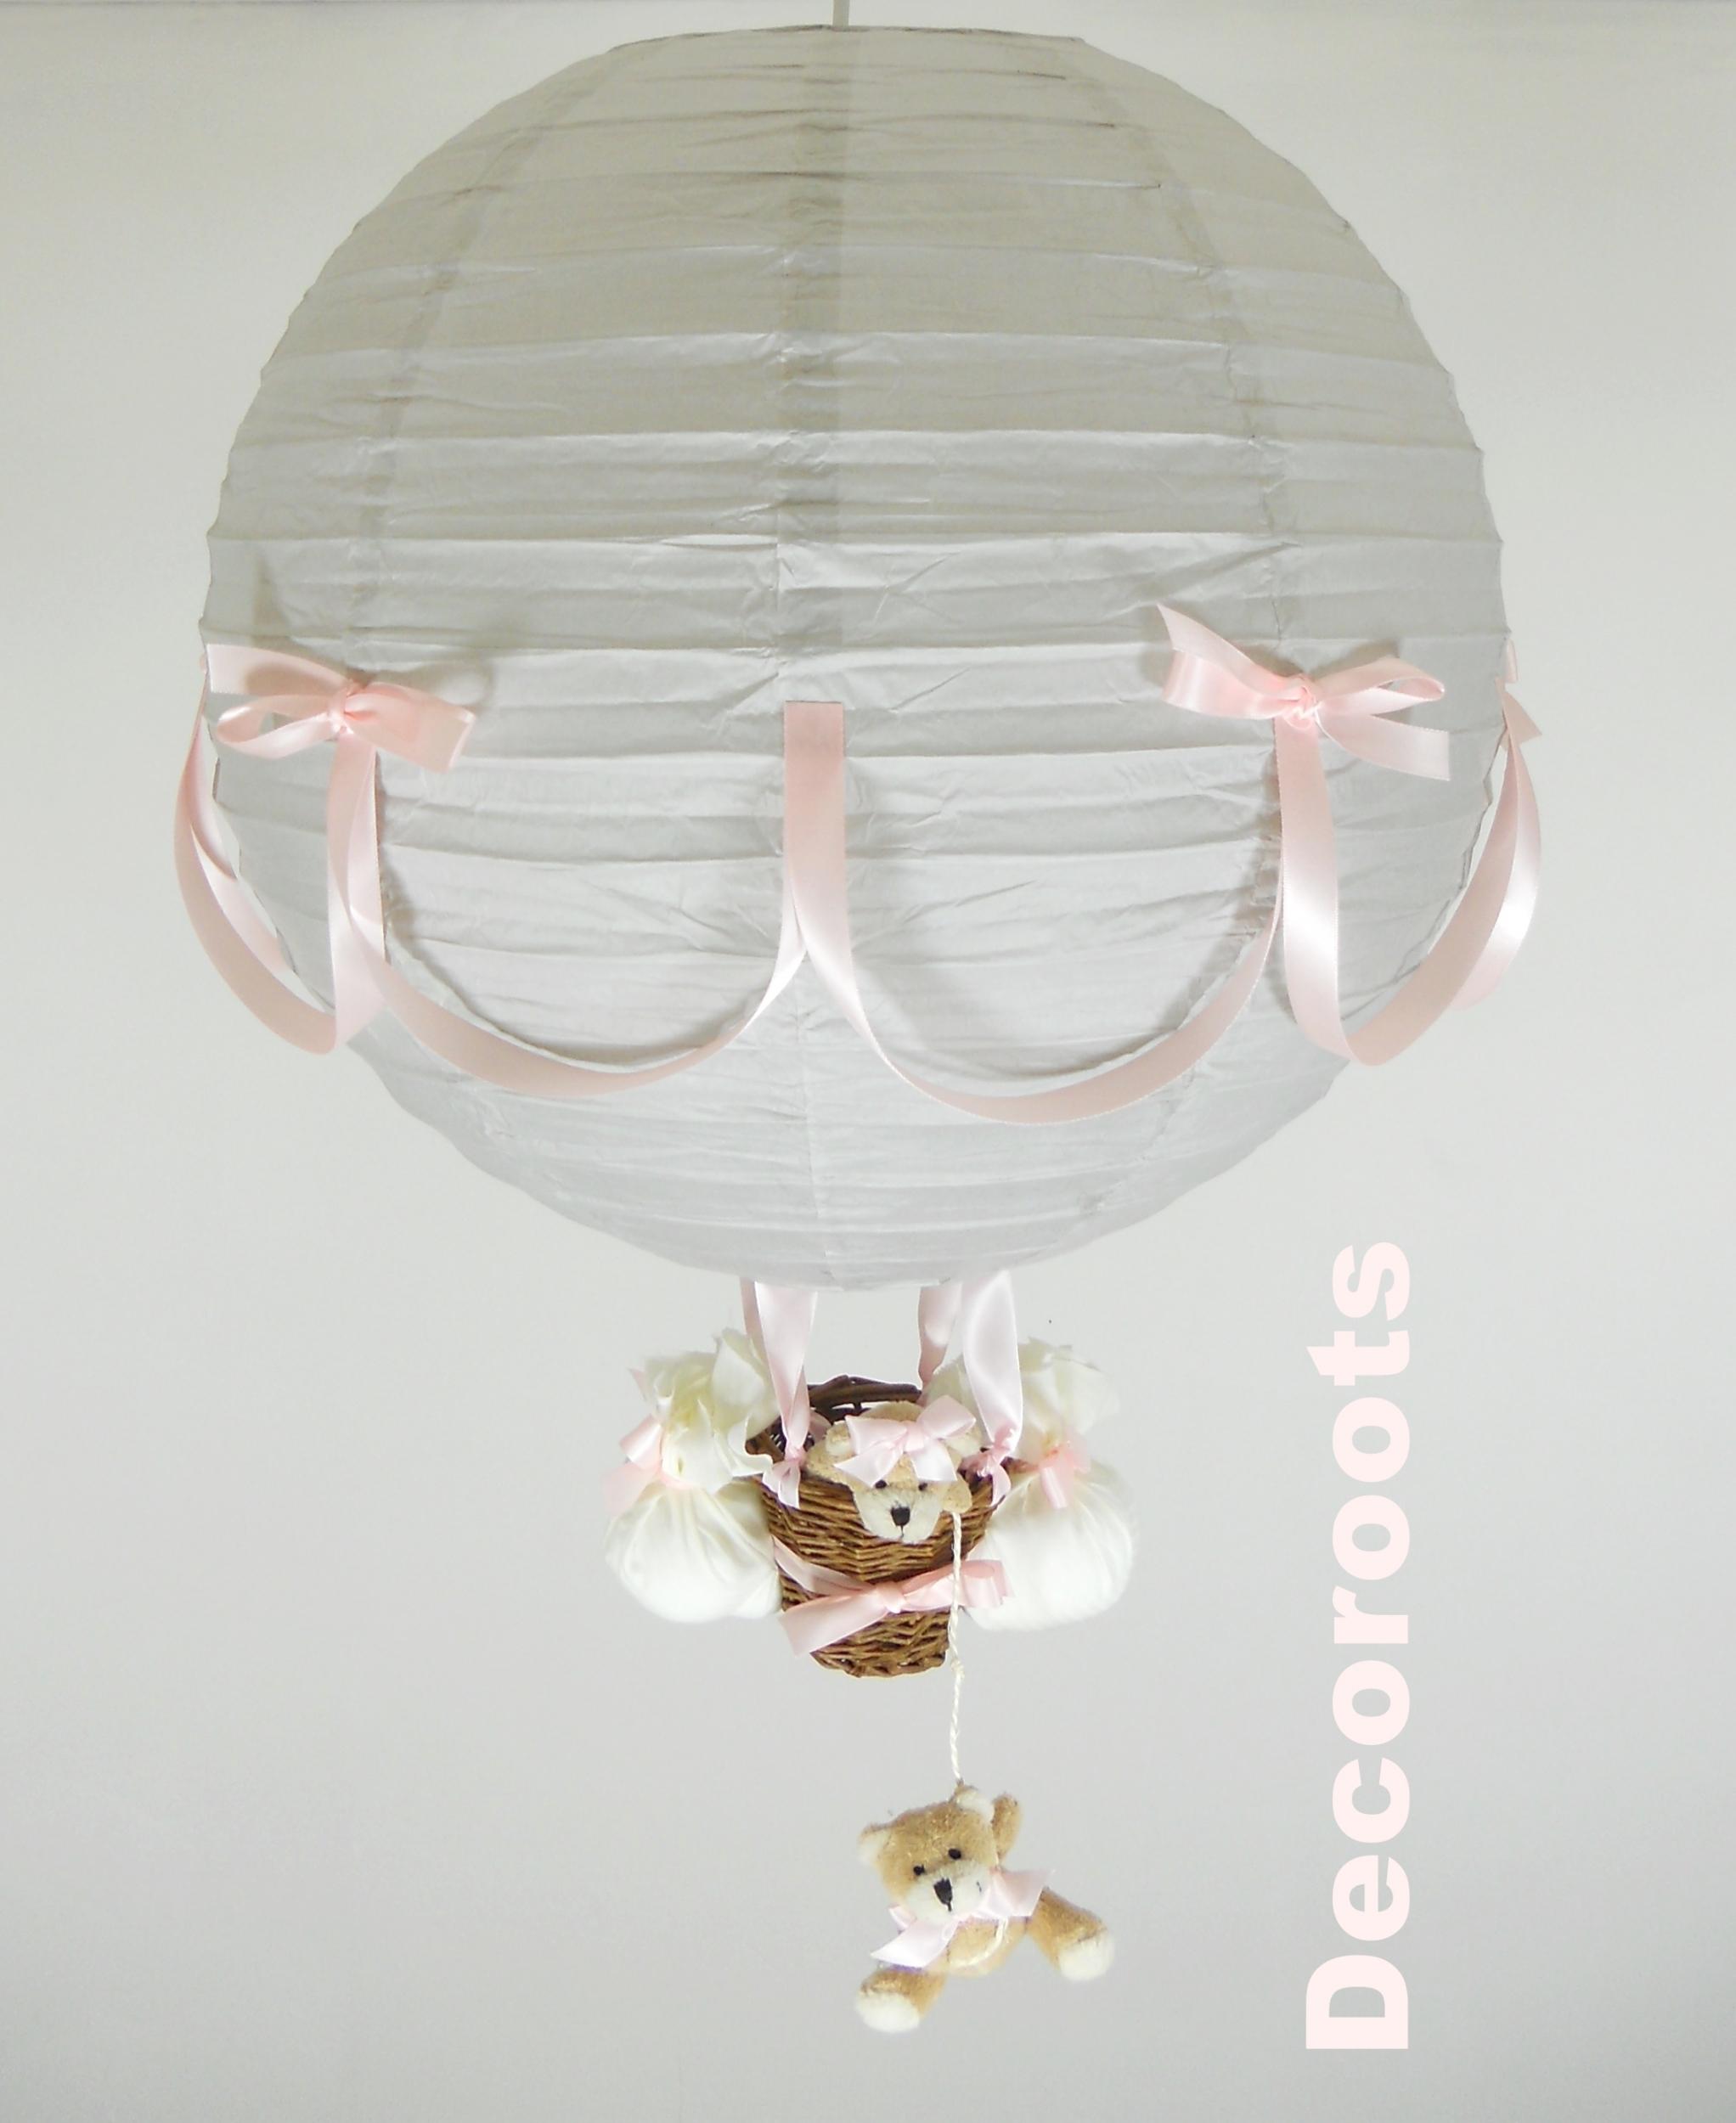 Lampe montgolfi re enfant b b fille ours gris et rose for Lampe chambre bebe fille